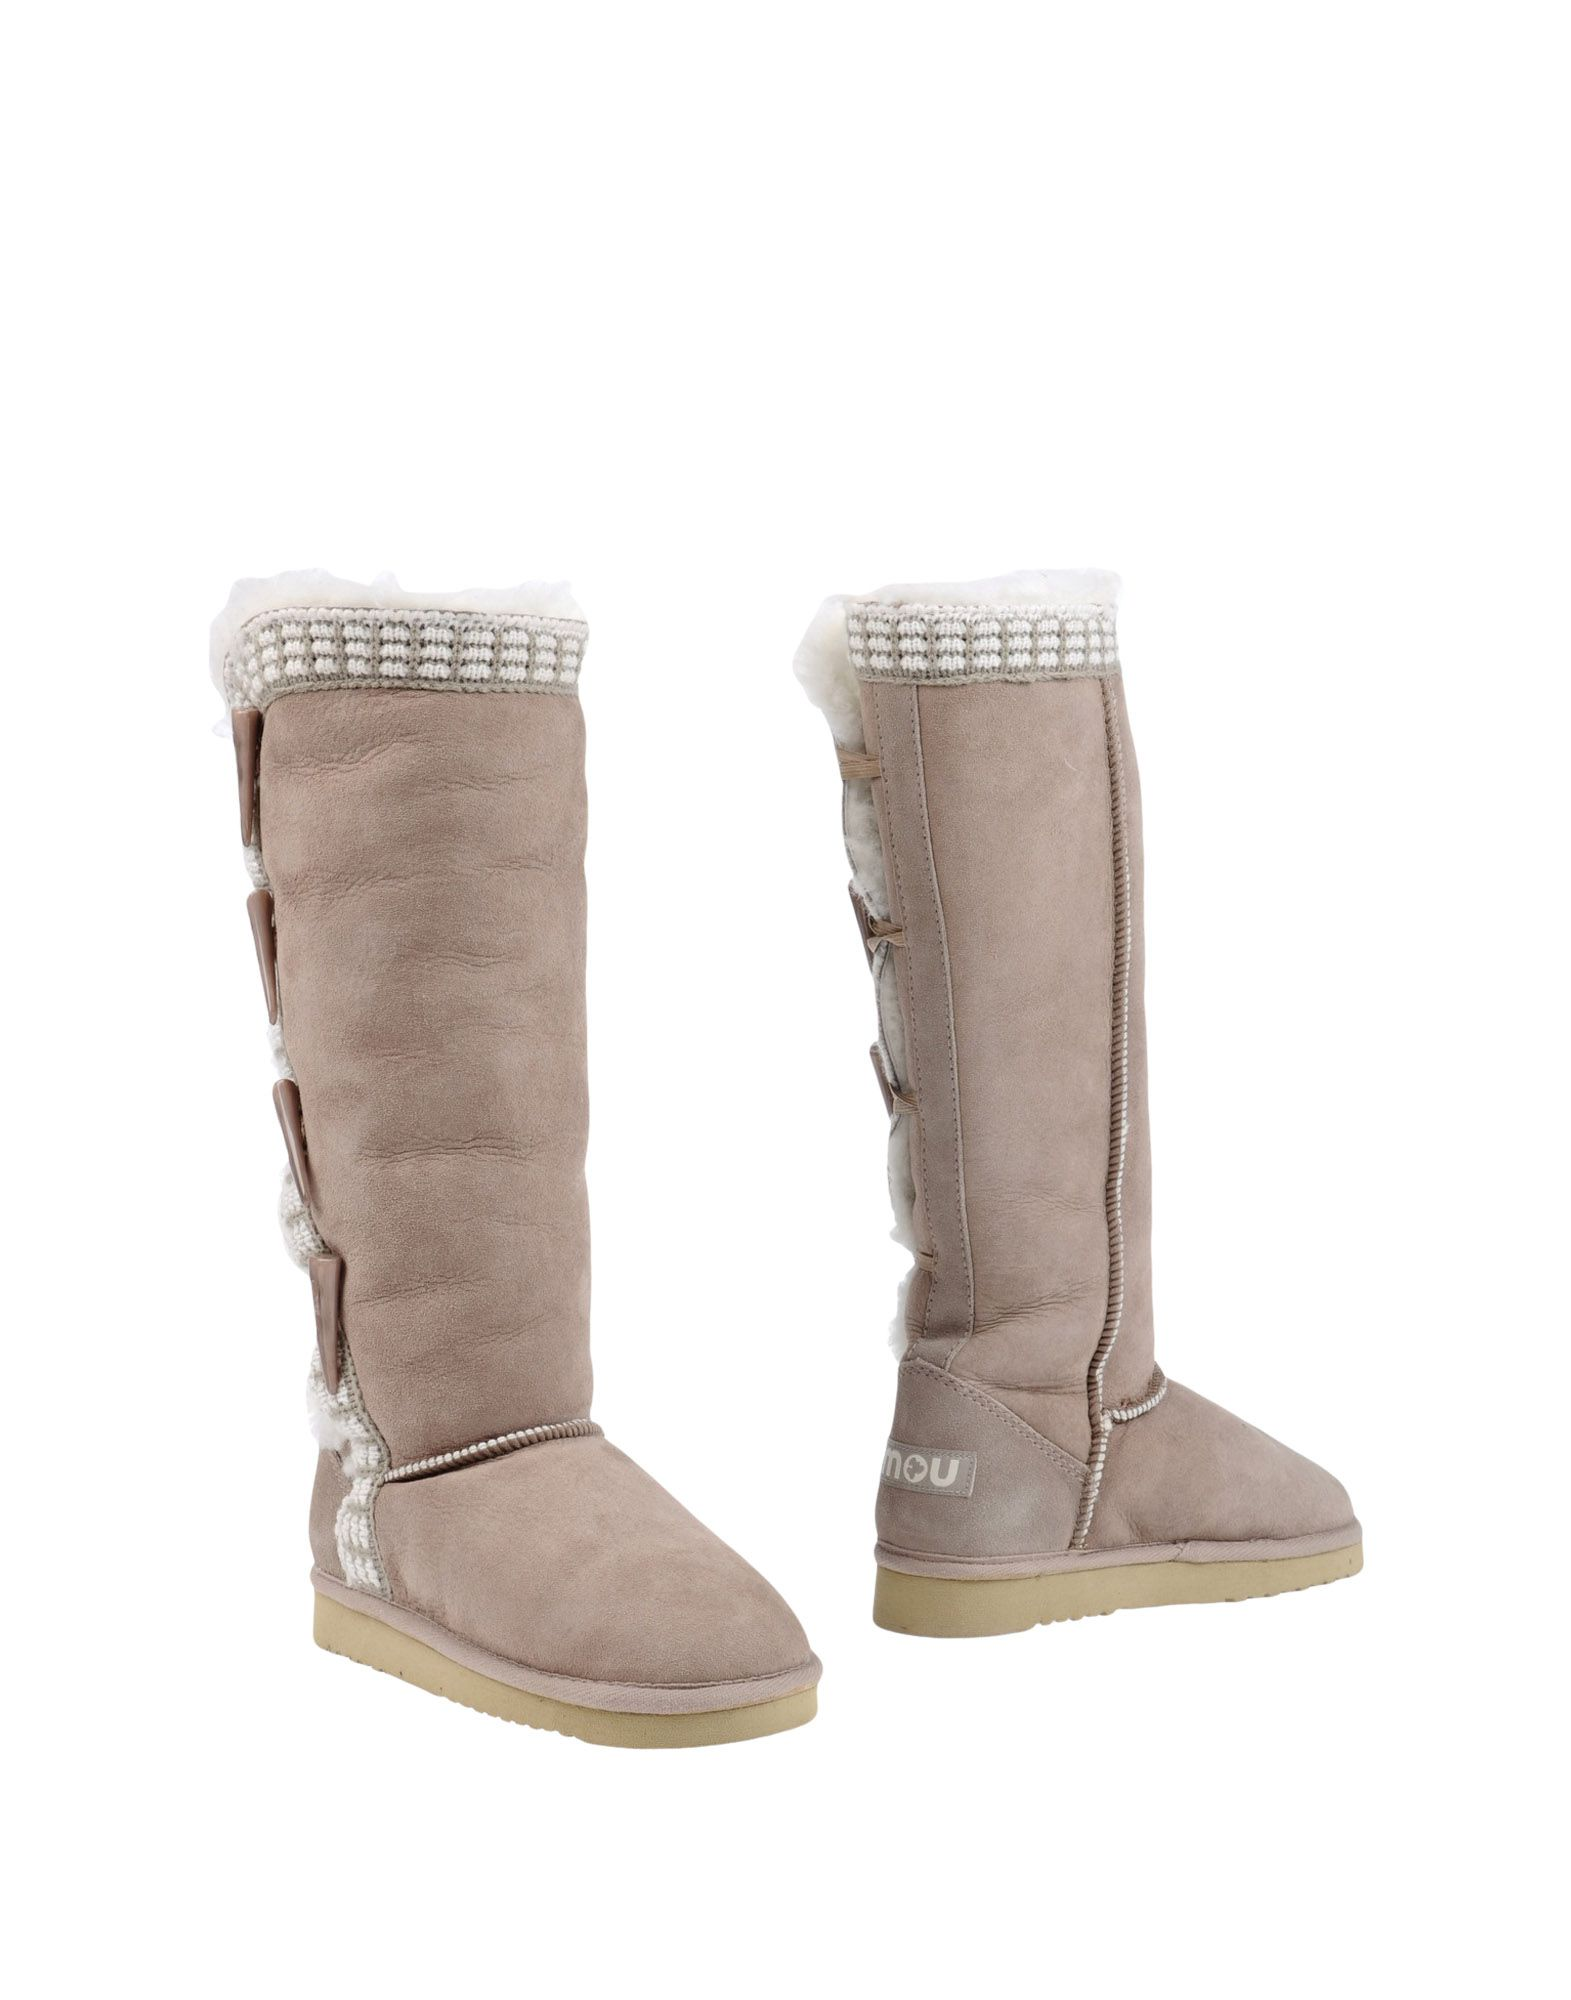 Schuhe Mou Stiefel Damen  11257727MG Heiße Schuhe  4299e1